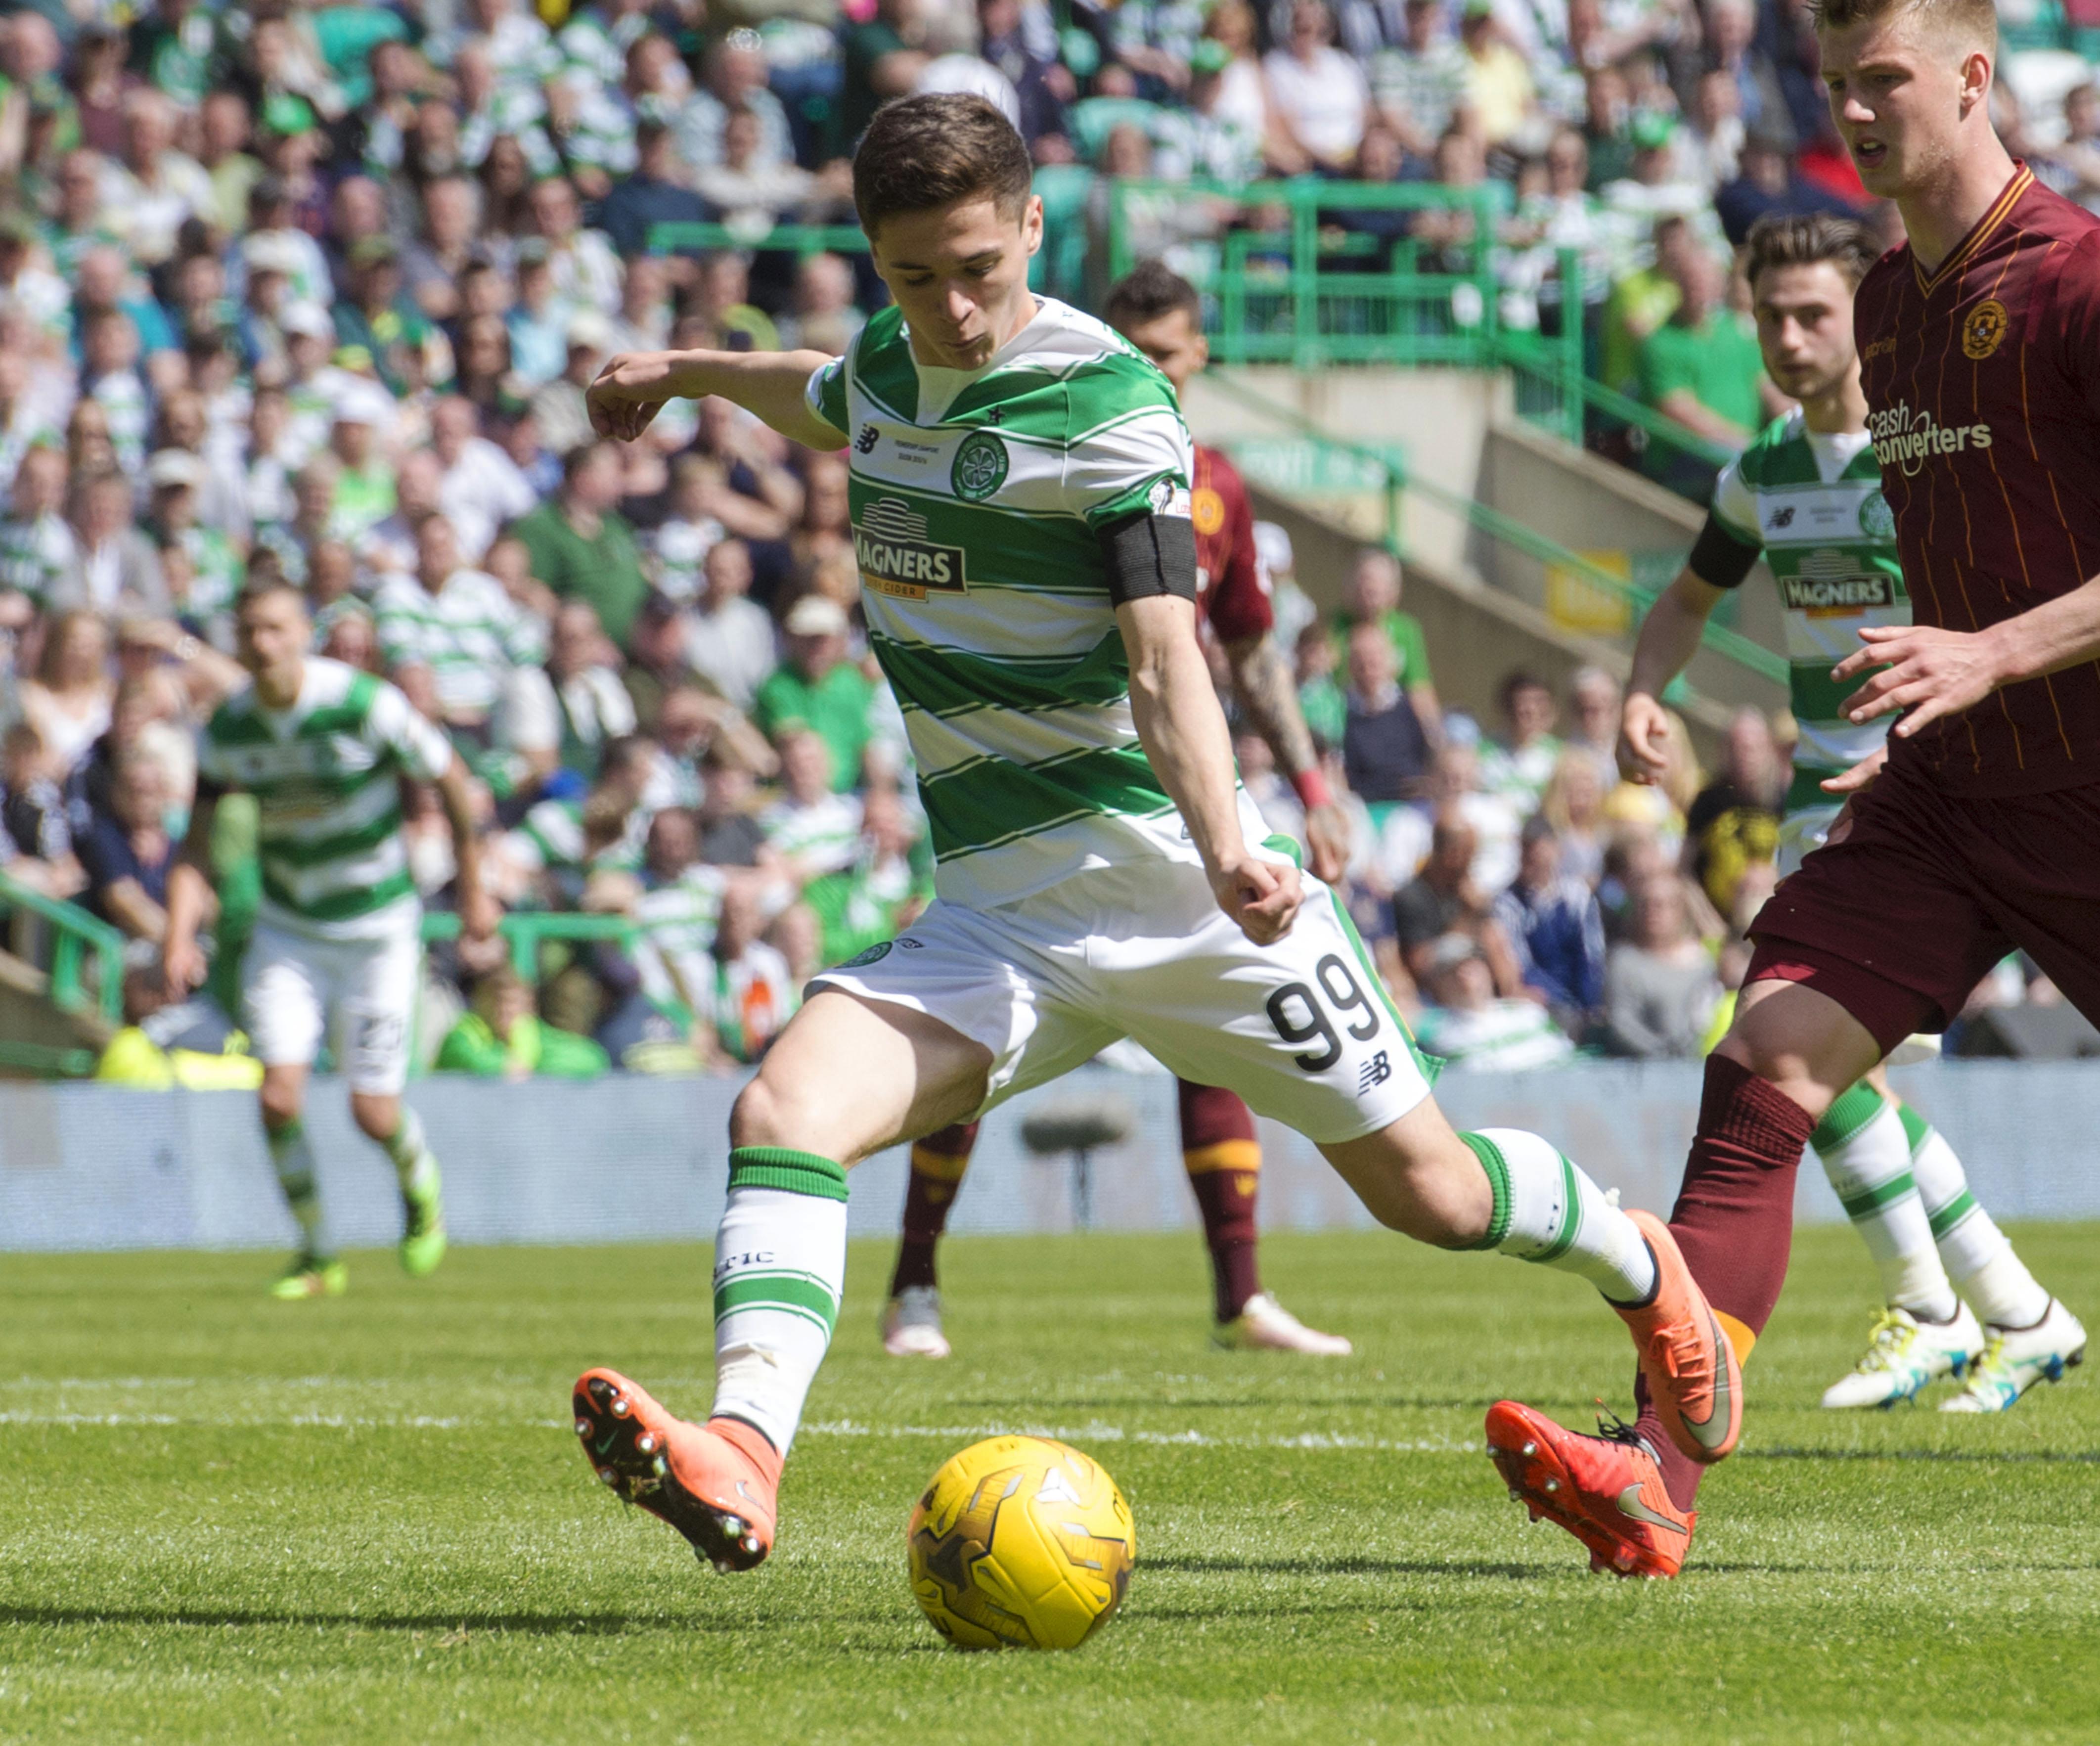 14/05/16 LADBROKES PREMIERSHIP .CELTIC v MOTHERWELL.CELTIC PARK - GLASGOW.Jack Aitchison in action for Celtic